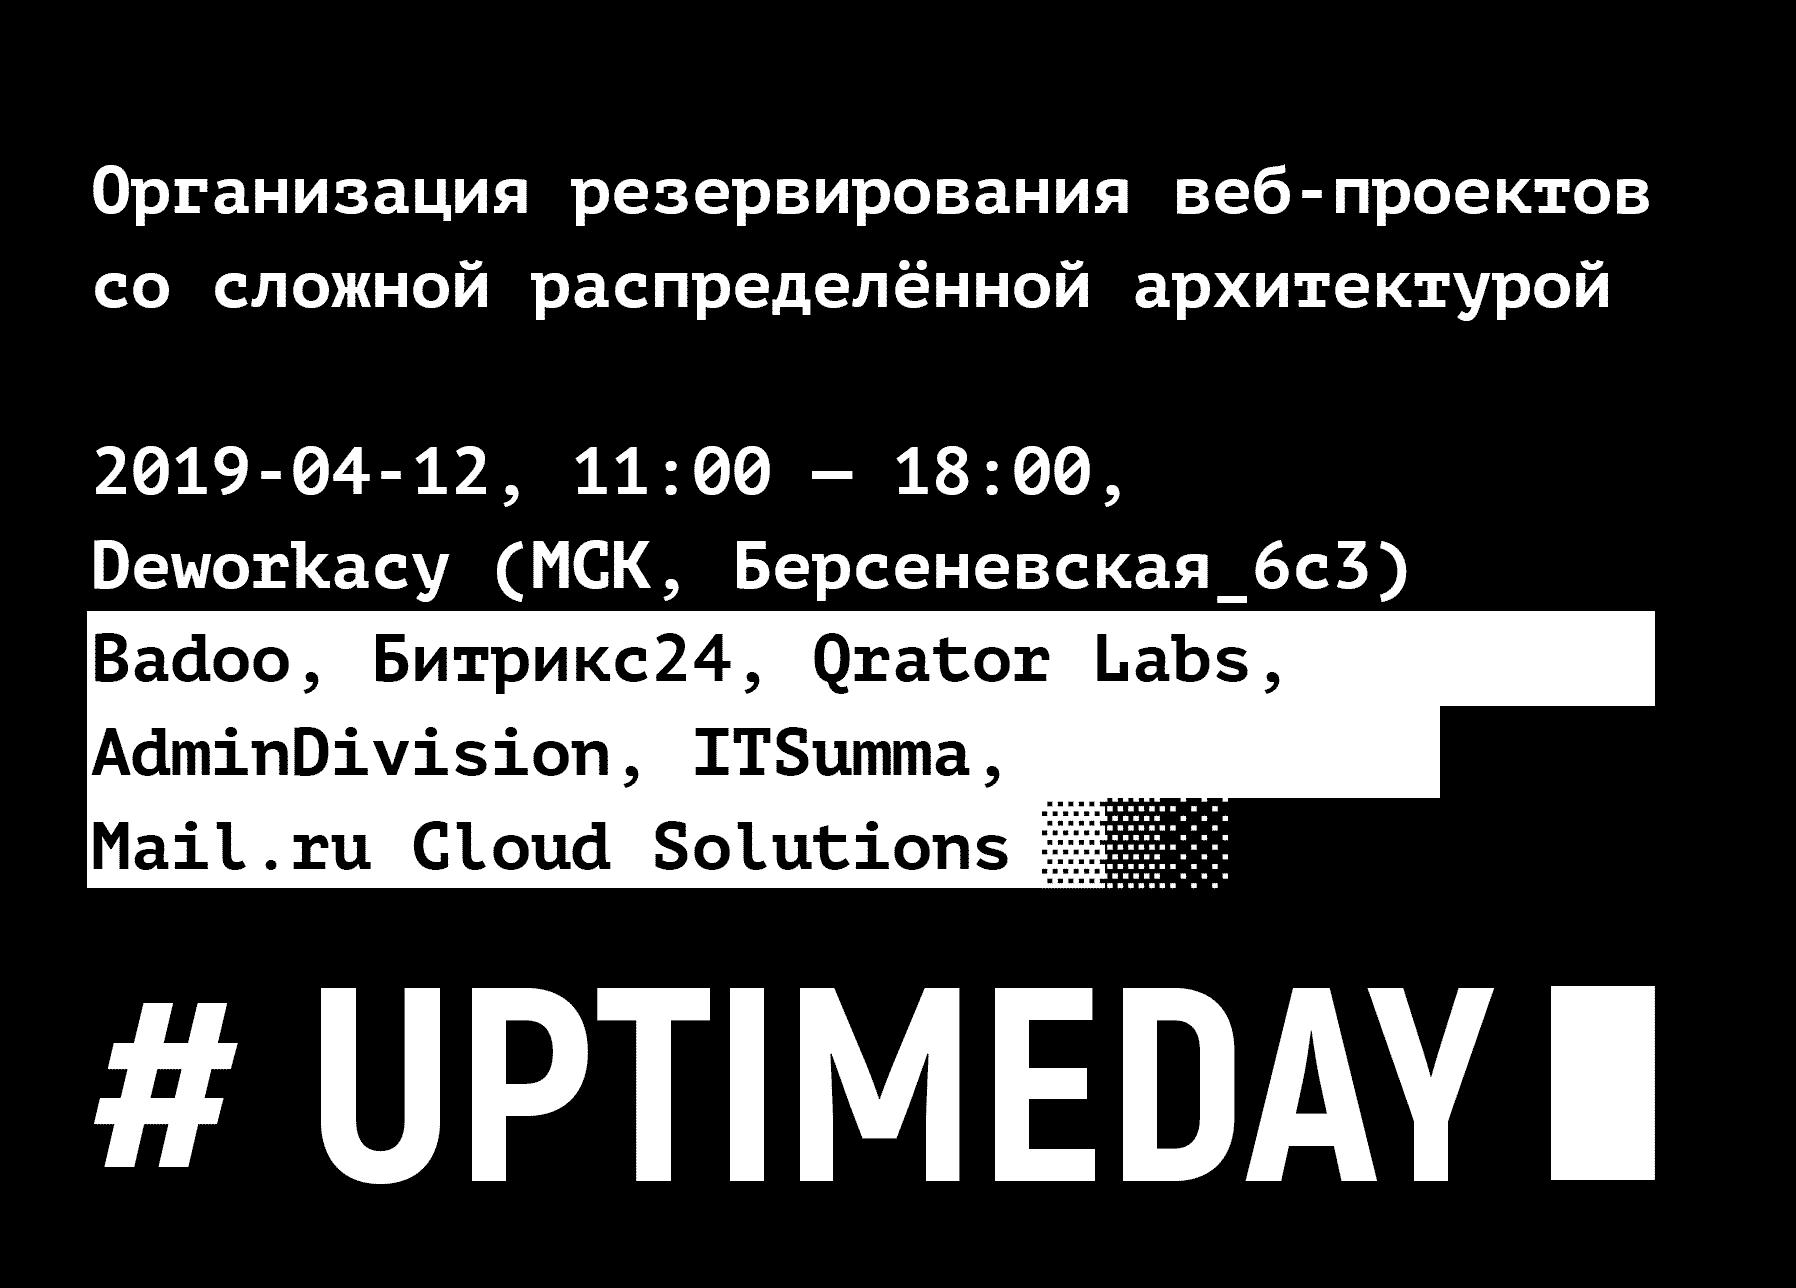 Uptime day: 12 апреля, полёт нормальный